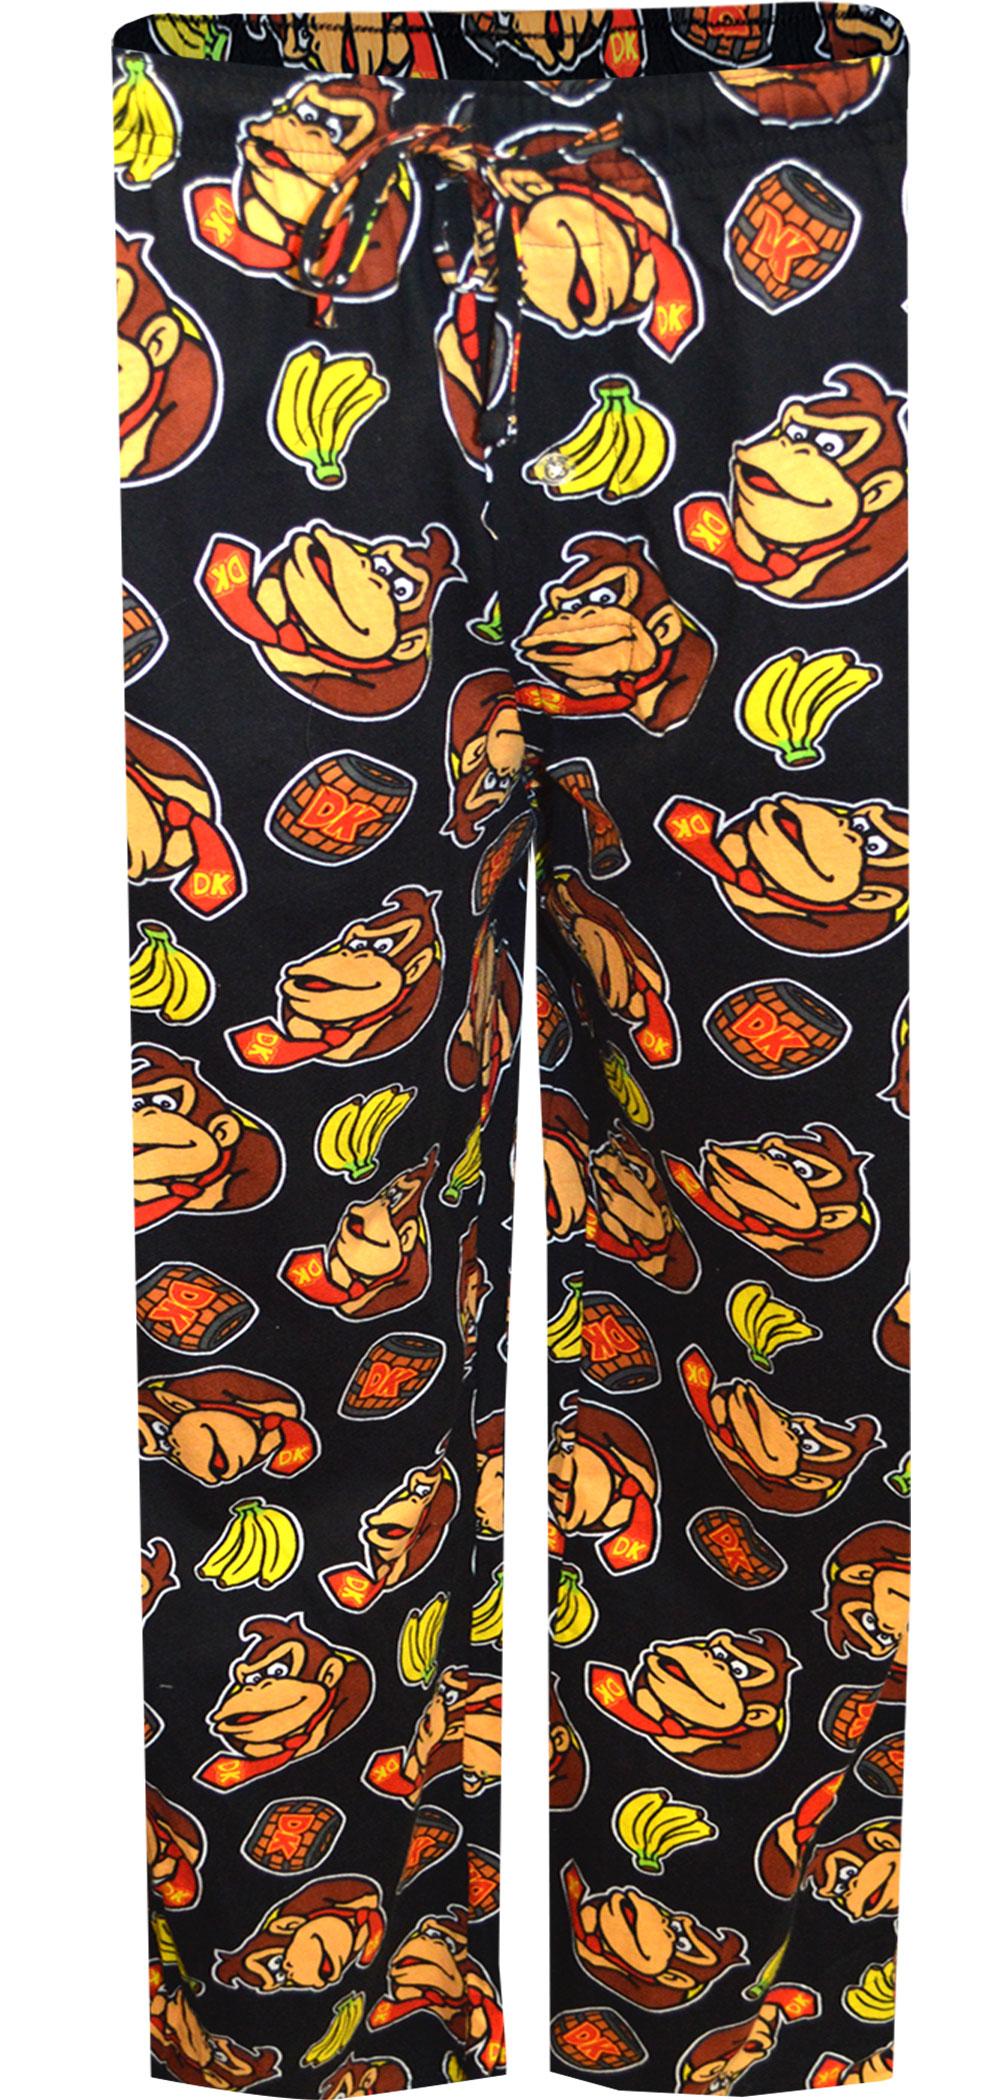 Image of Nintendo Donkey Kong Black Cotton Lounge Pants for men